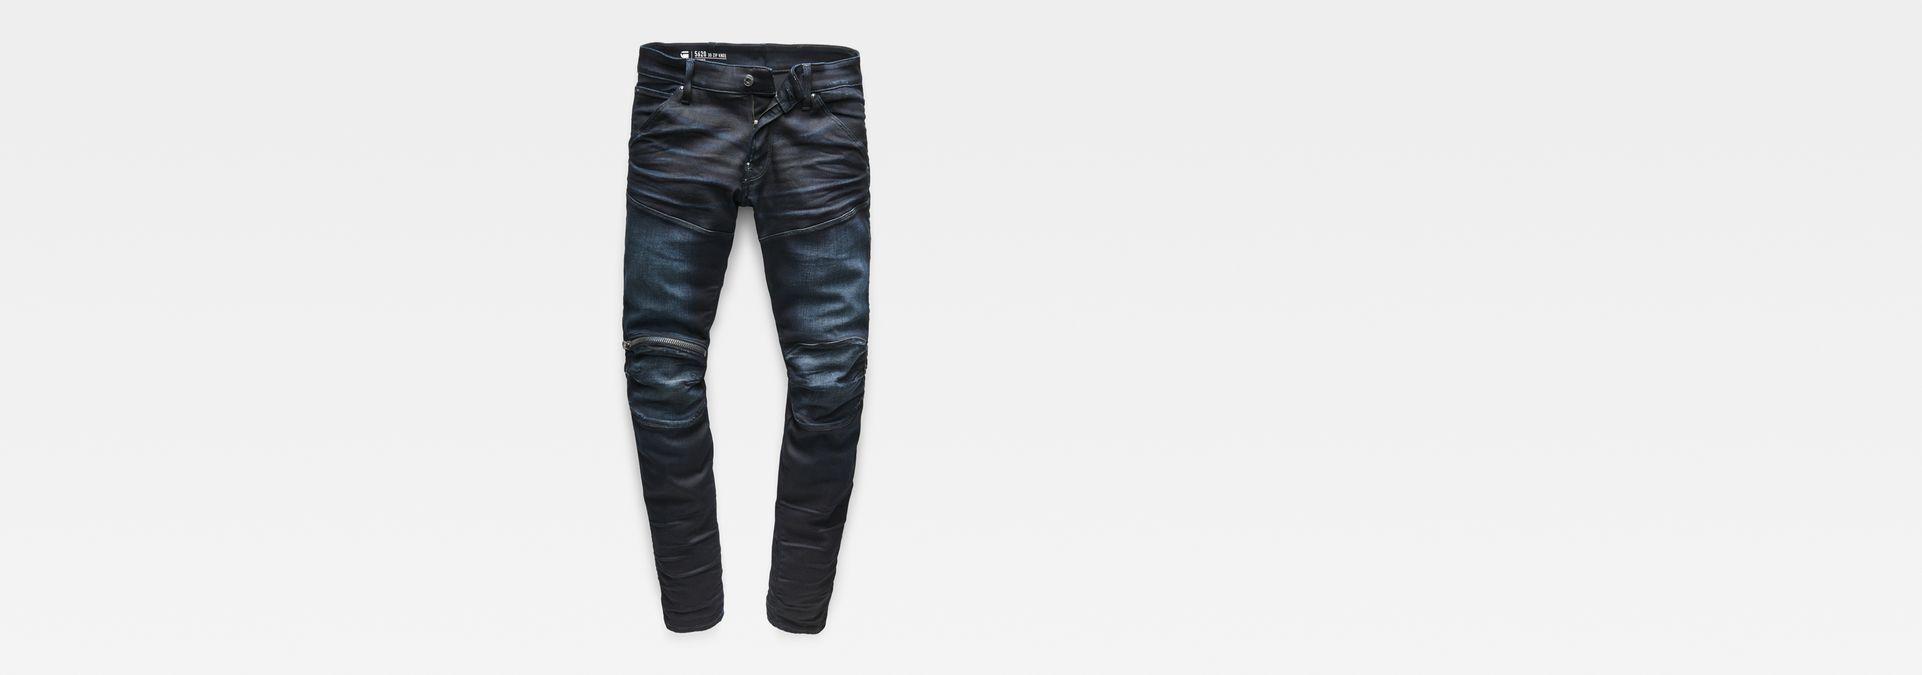 6706c3c396c35e 5620 3D Zip Knee Super Slim Jeans | Dark Aged | Men | G-Star RAW®